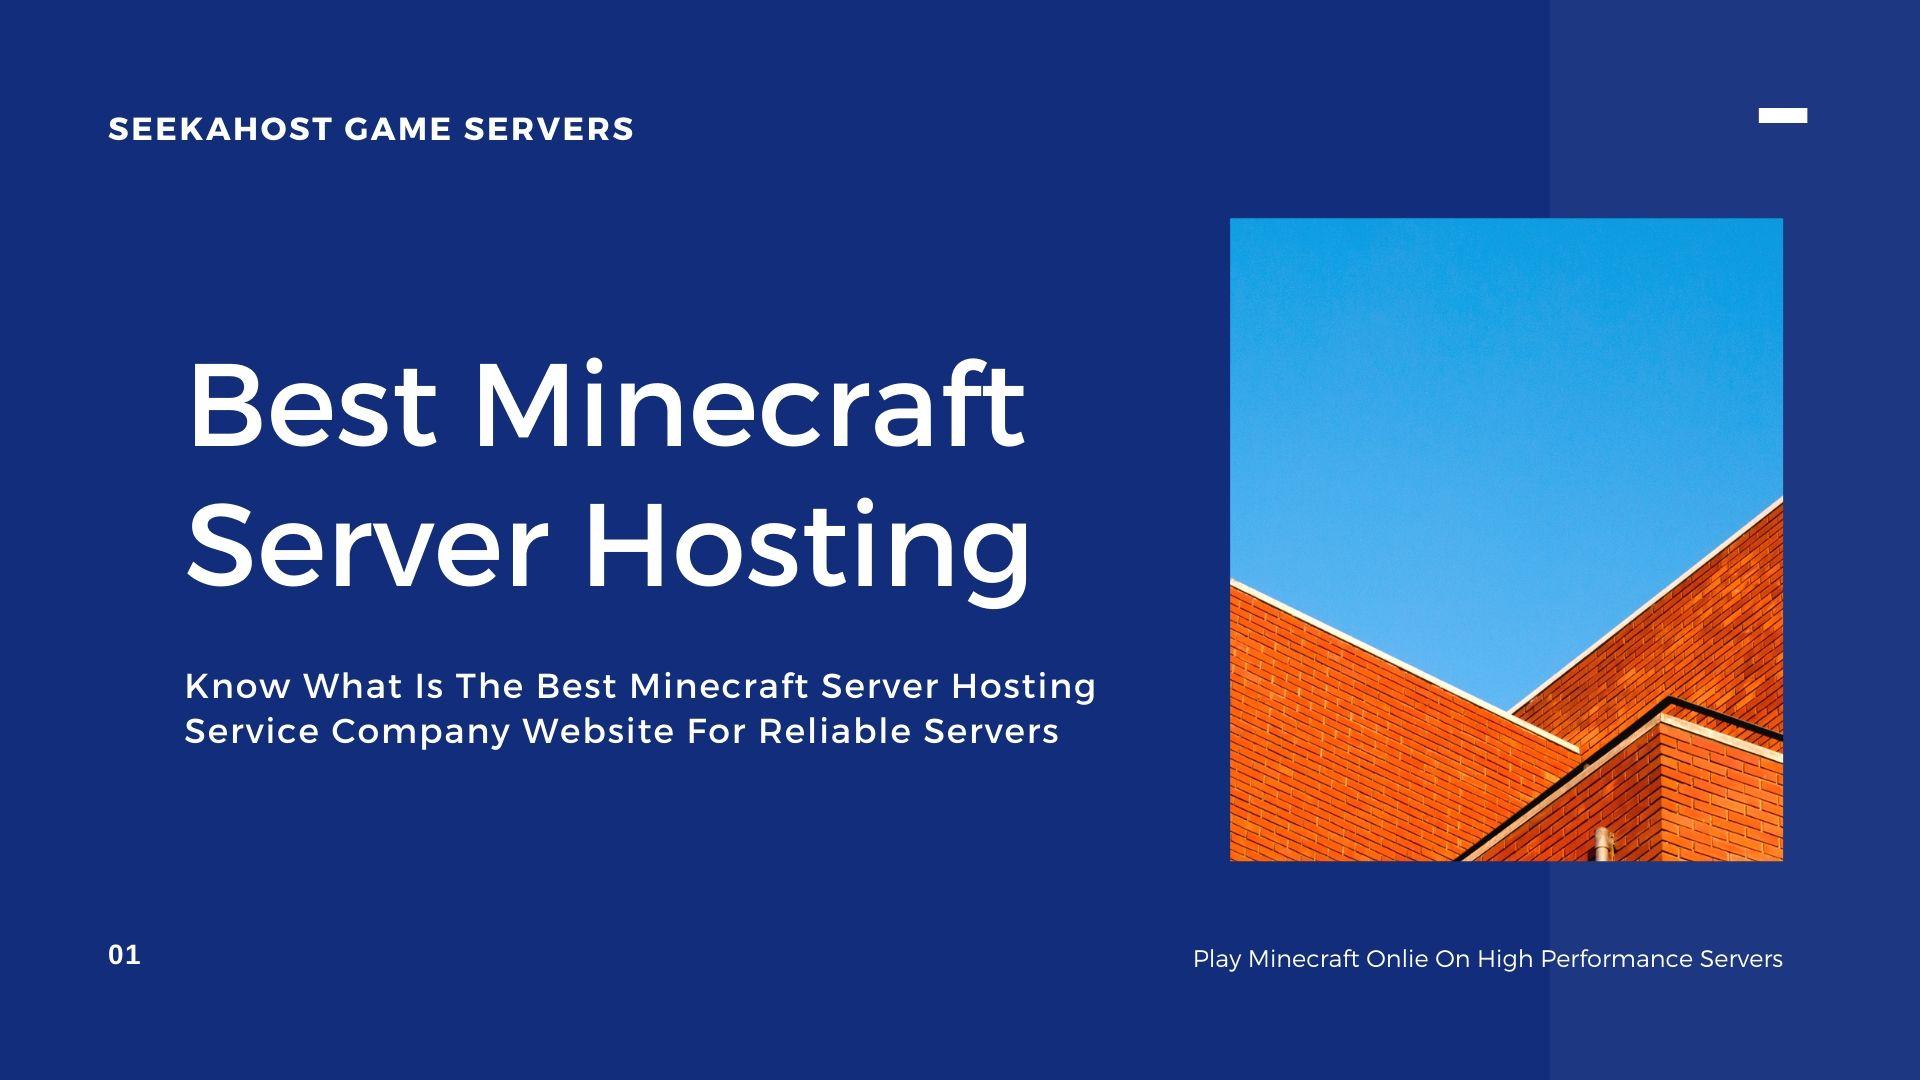 Best-Minecraft-Server-Hosting